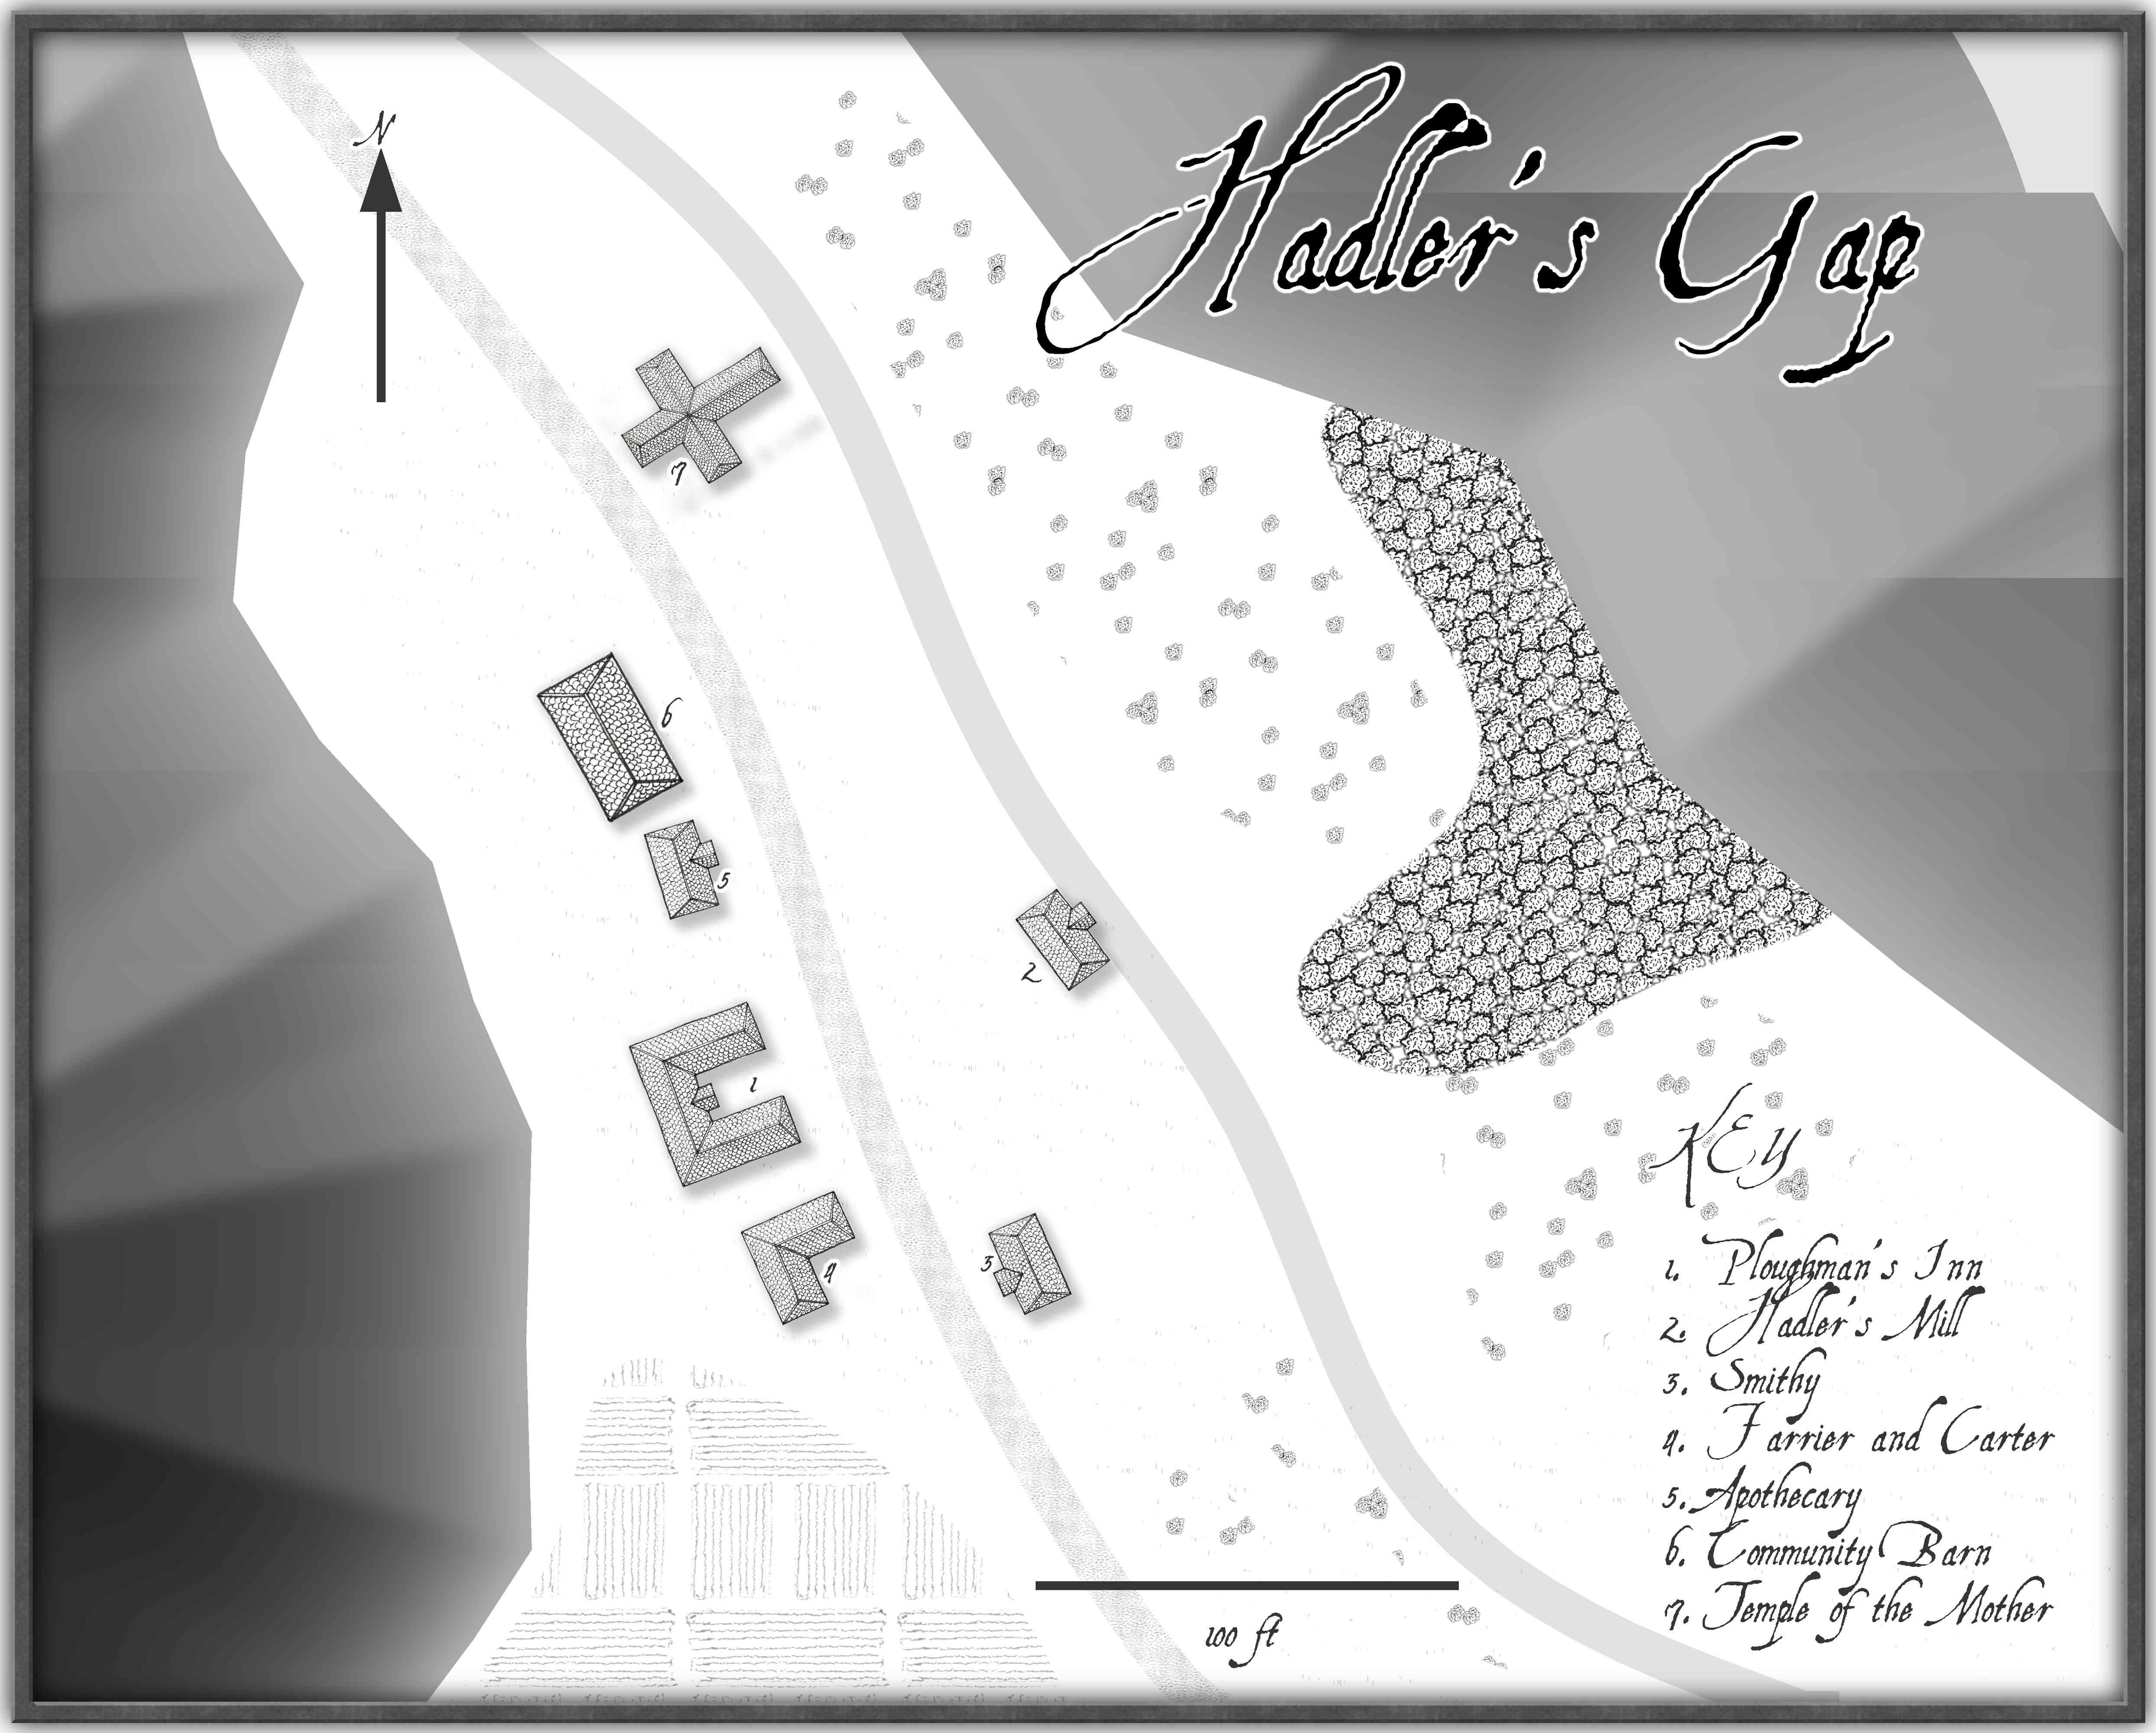 LVoTR_Hadler's Gap.JPG